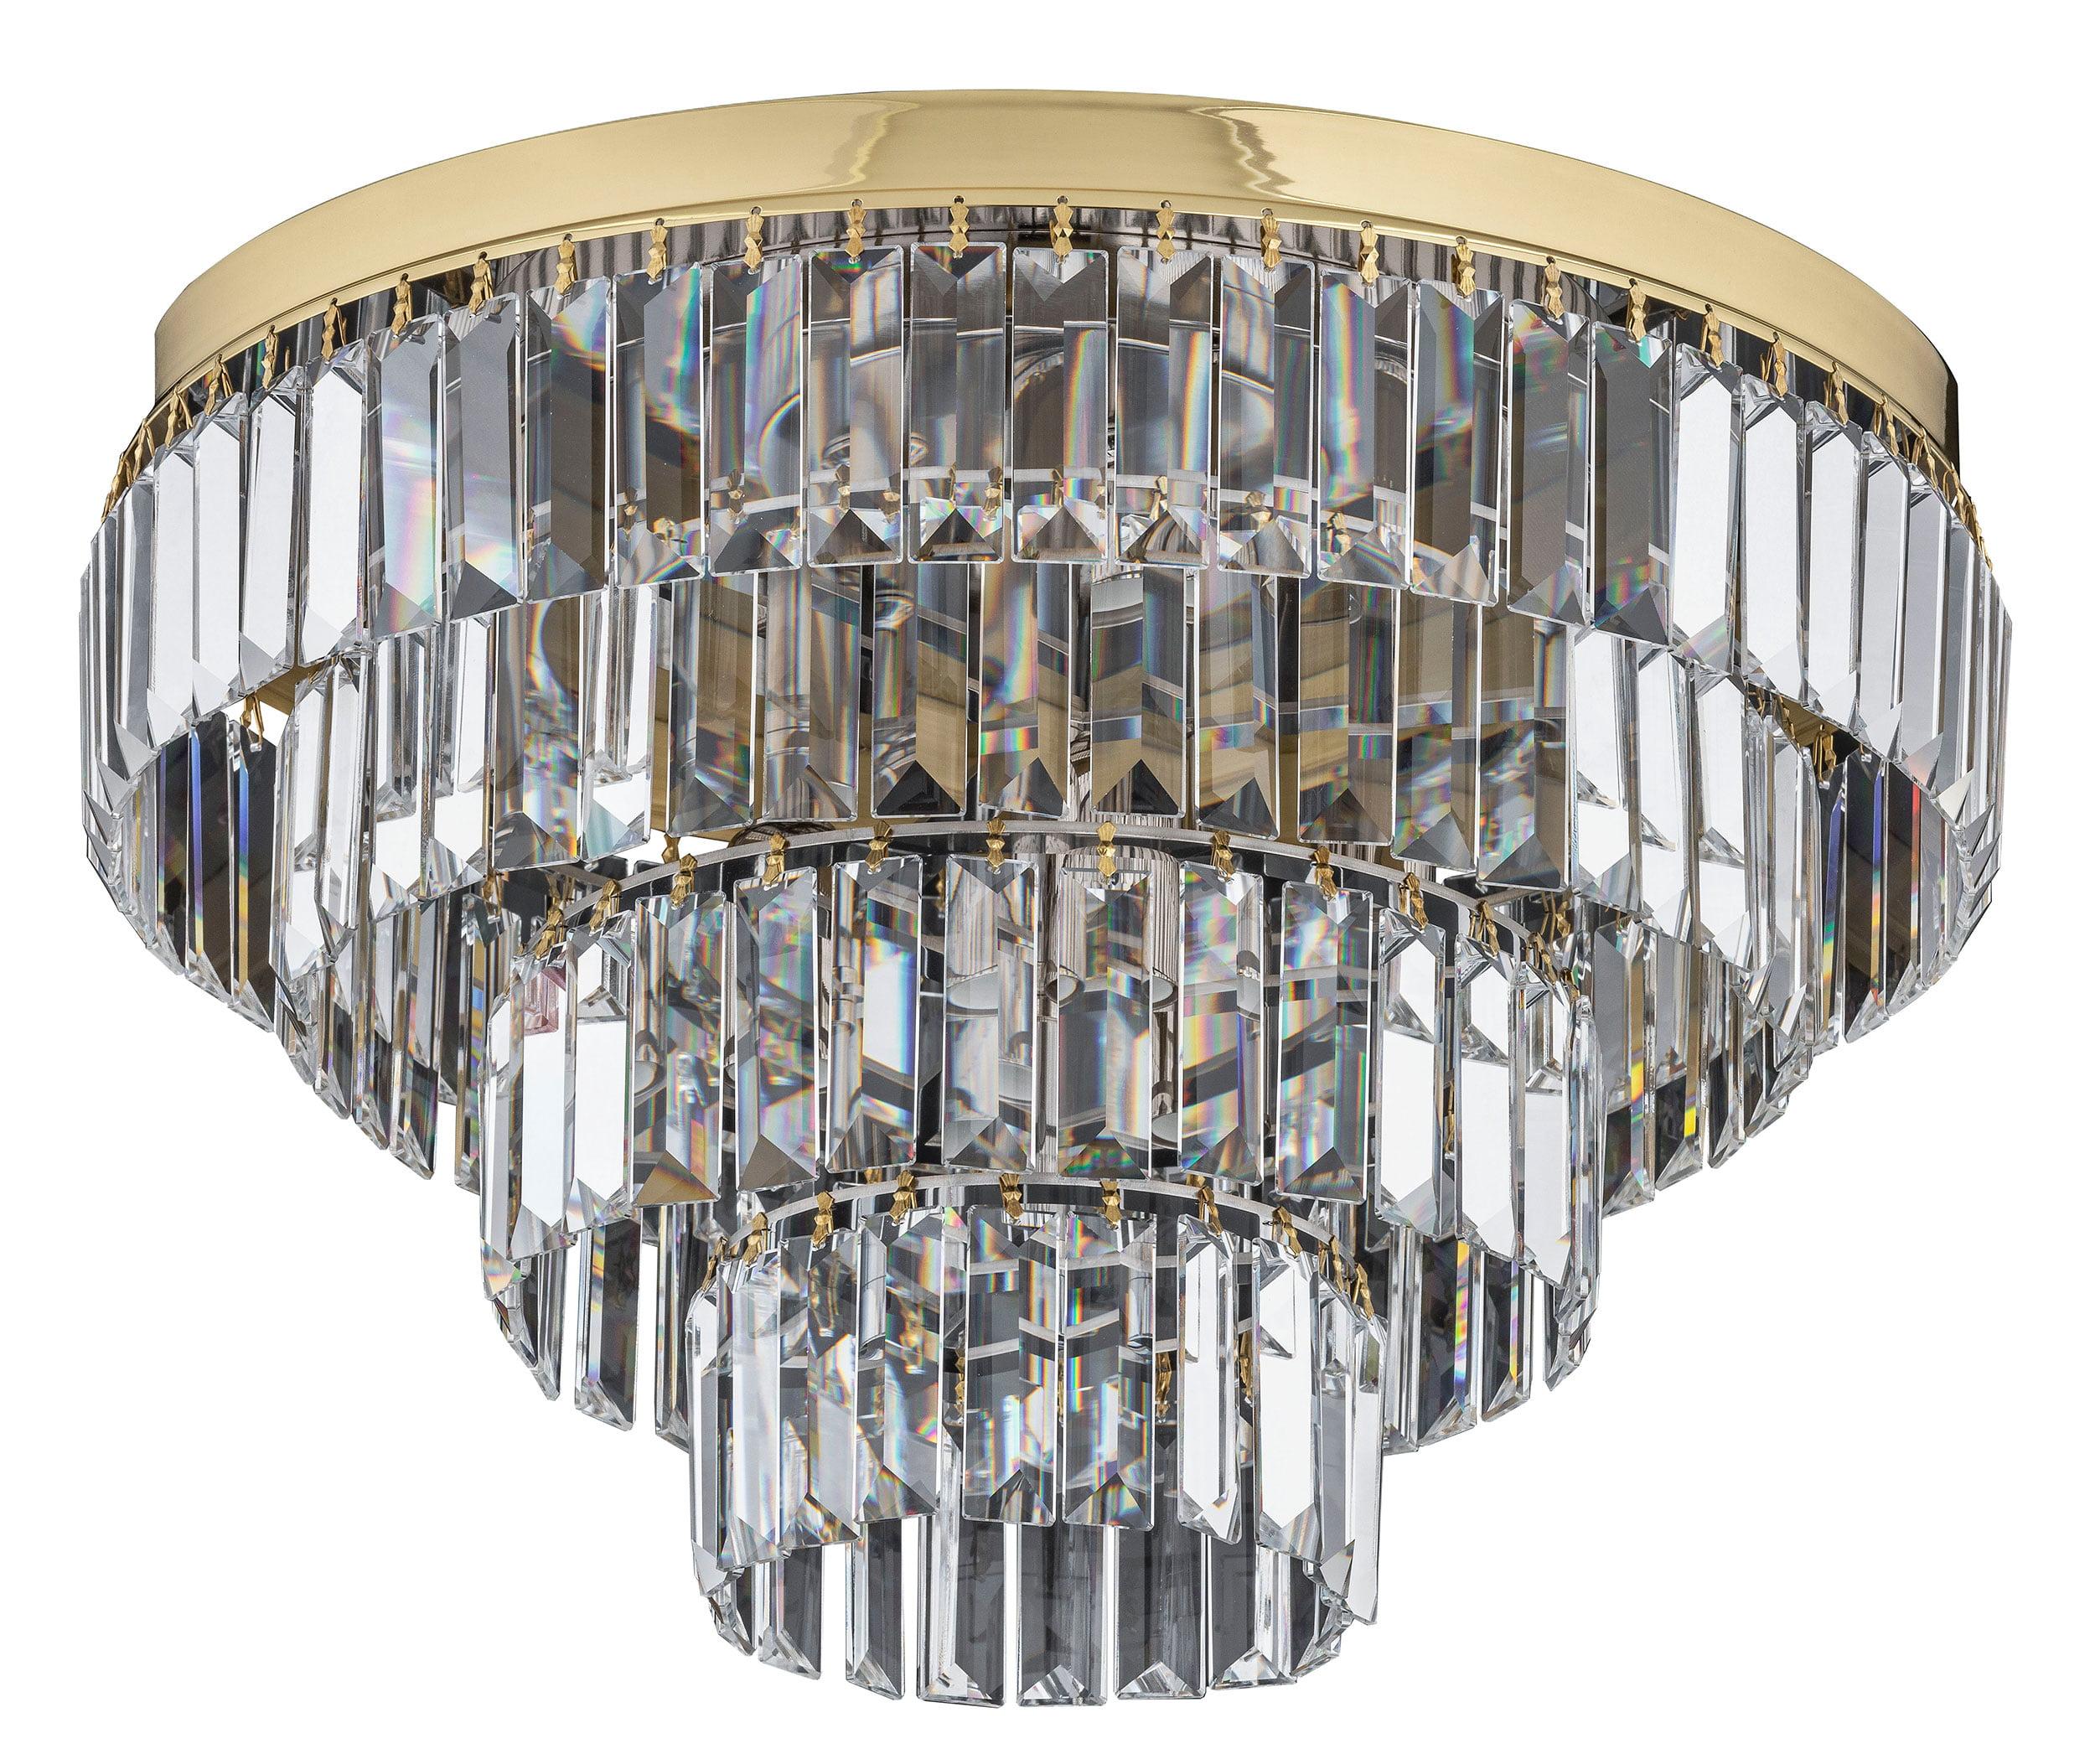 Swarovski Crystal Classic Chandelier Light in Gold | Costco UK